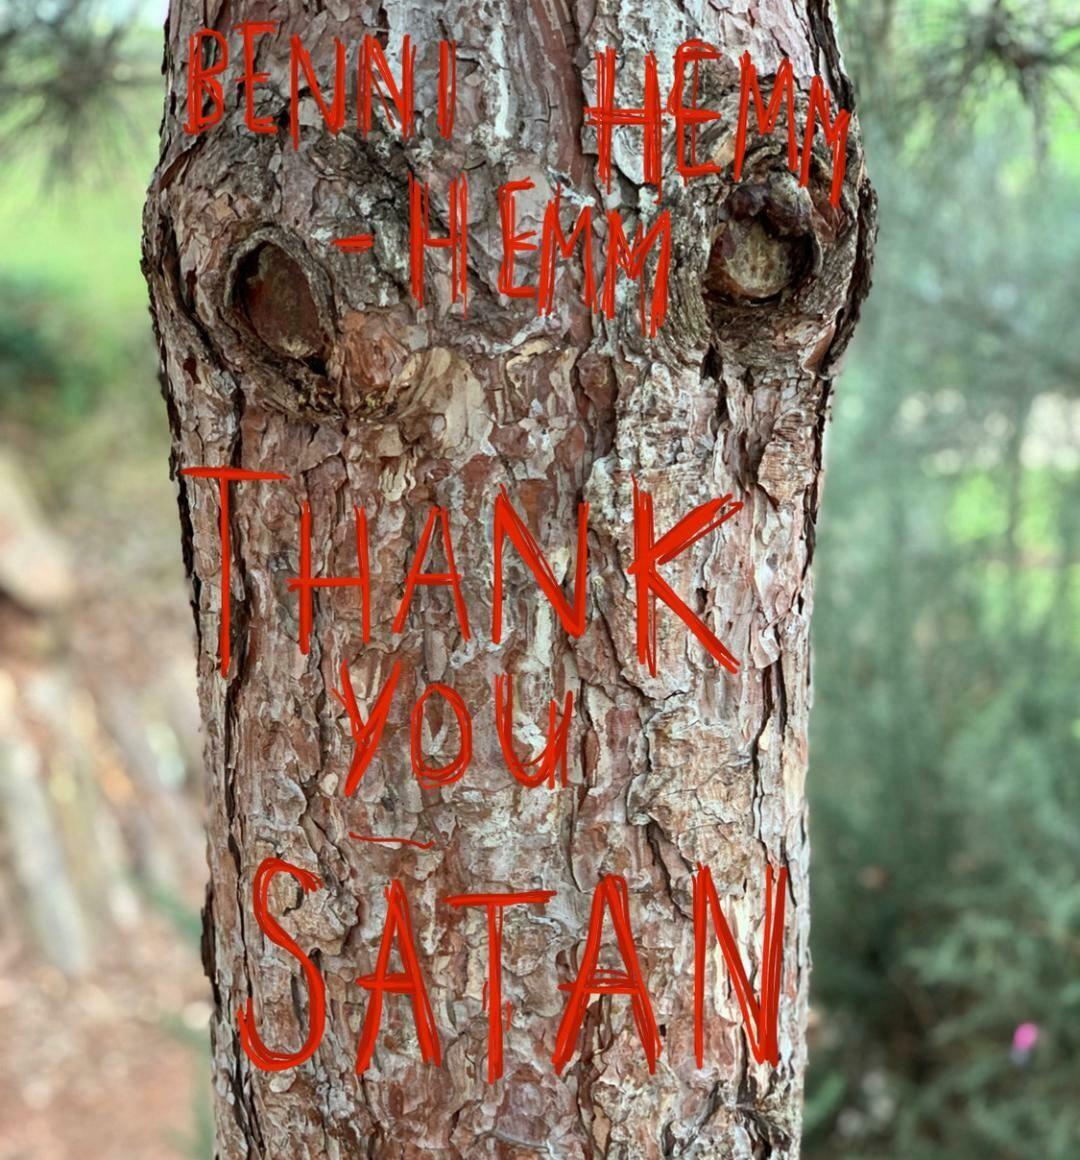 Benni Hemm Hemm - Thank You Satan LP